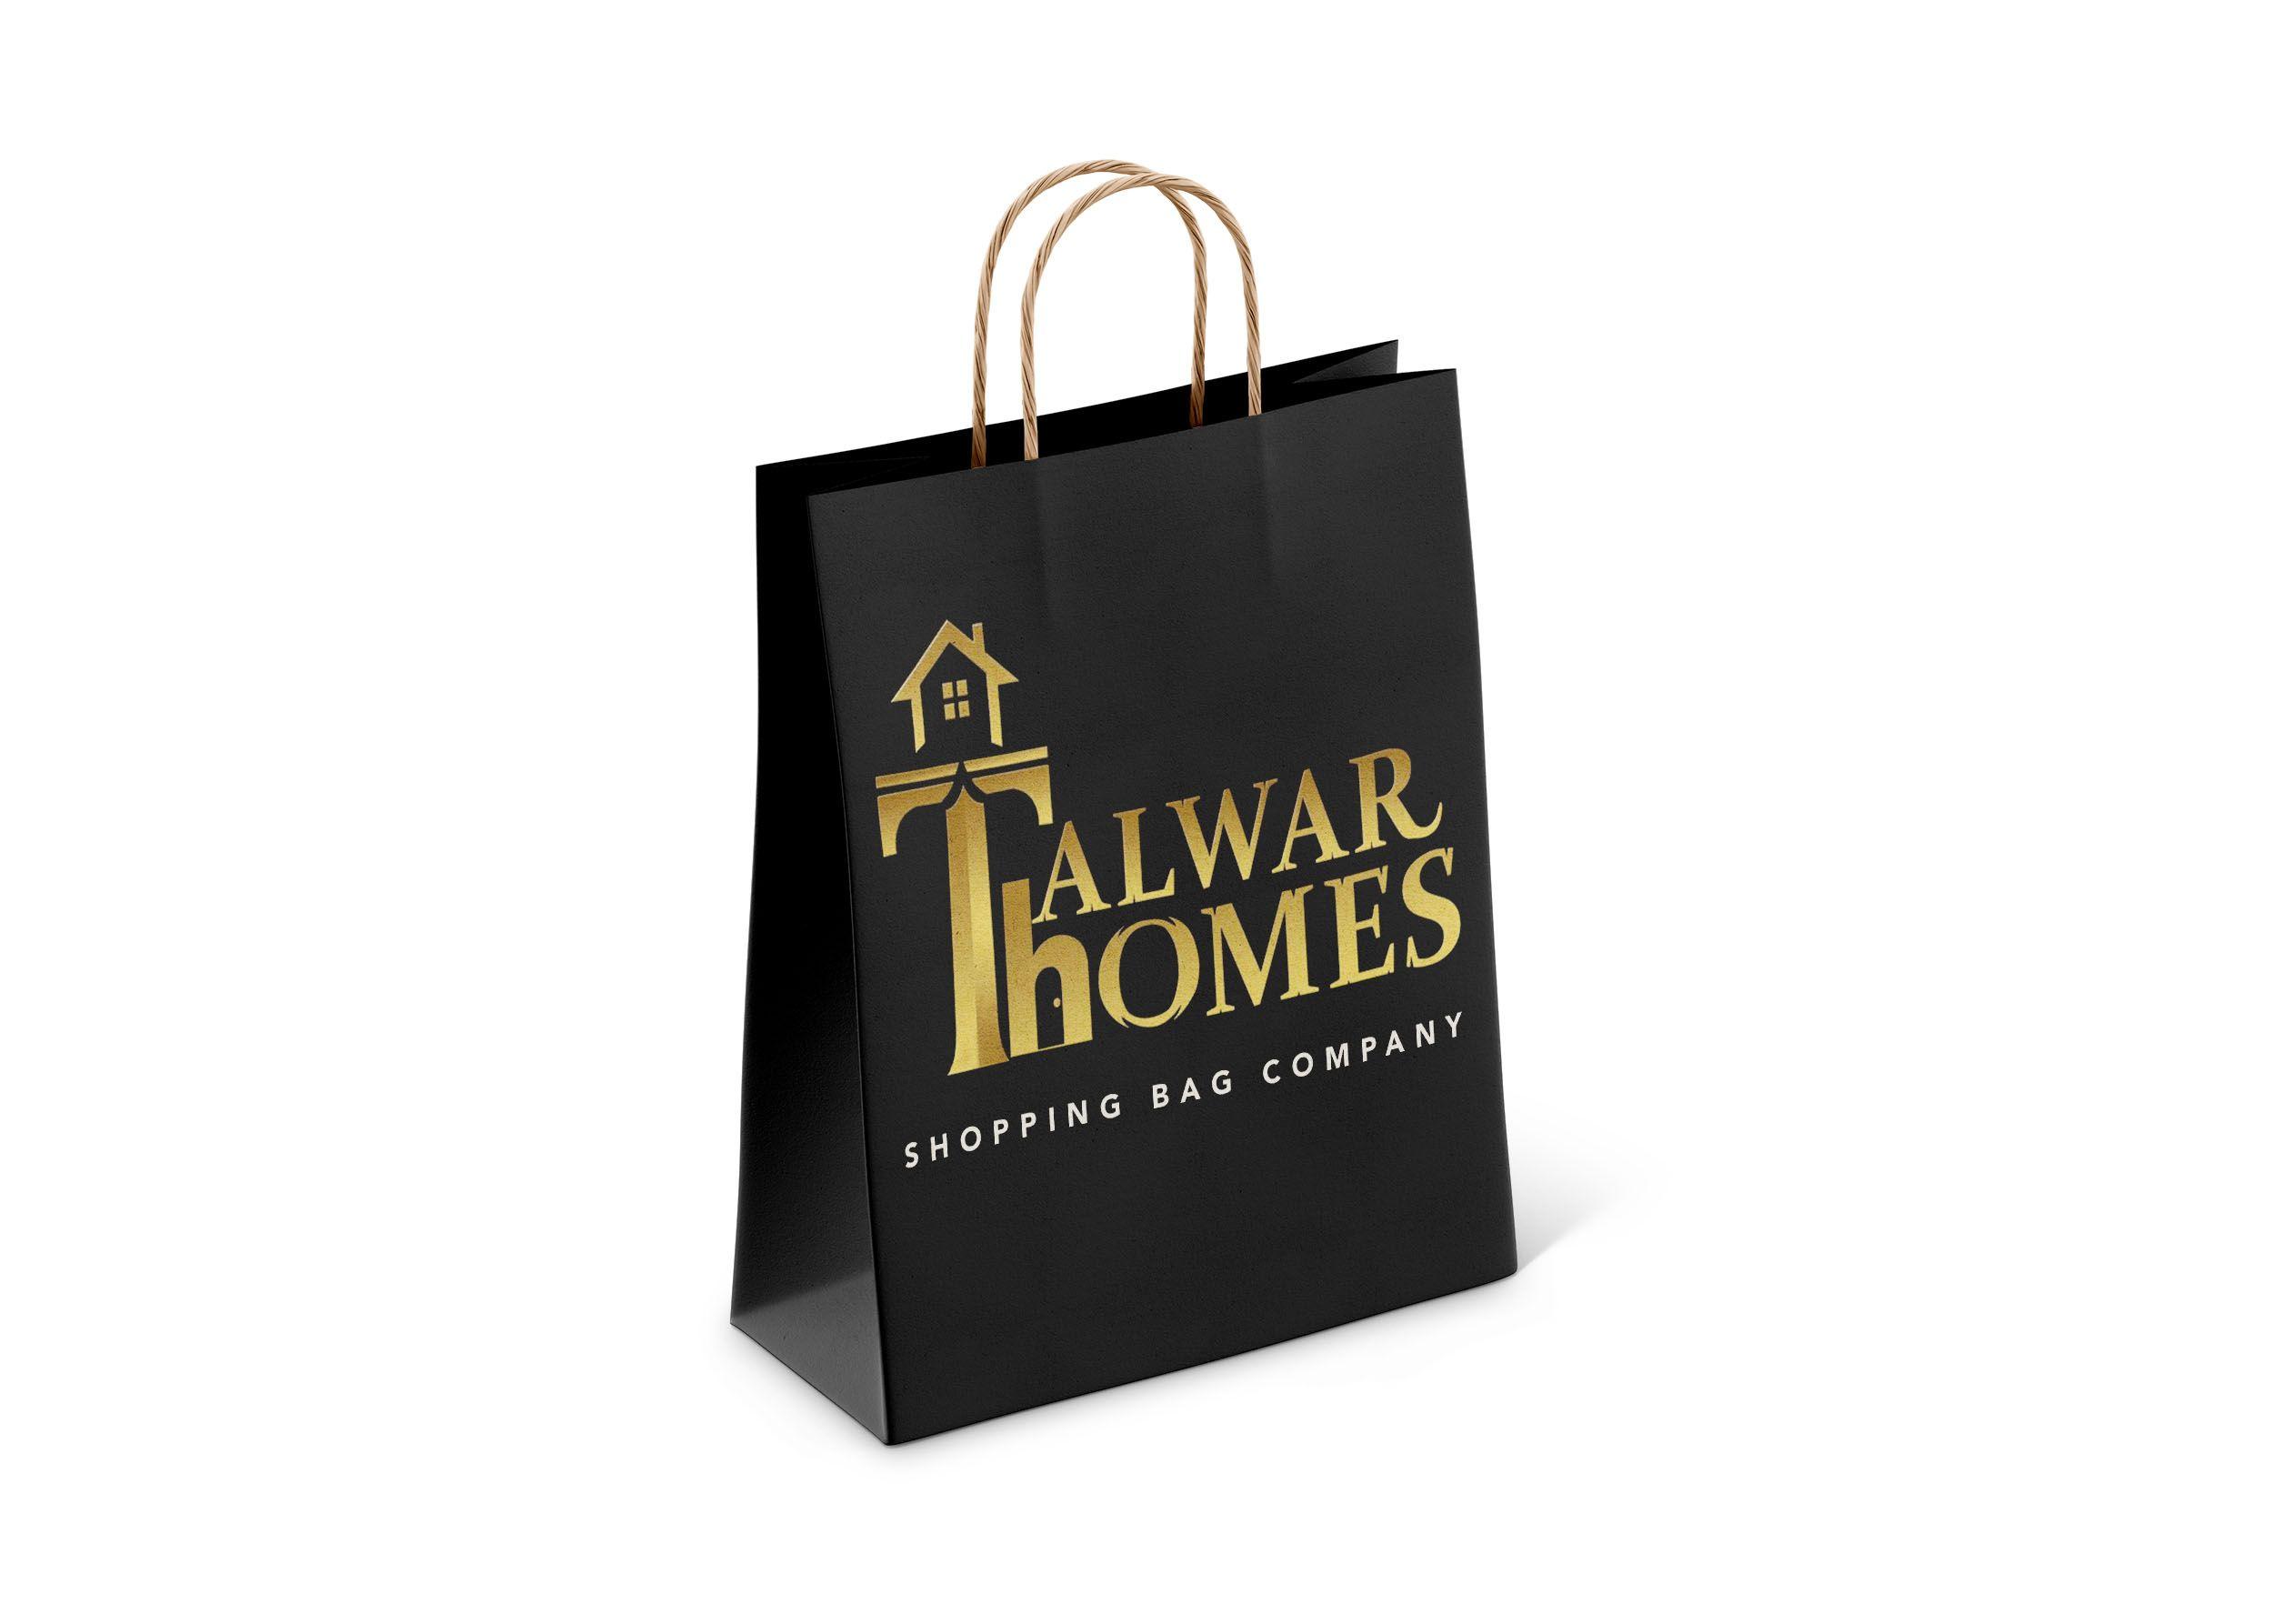 Download Free Psd Golden Label Shopping Bag Mockup Bag Mockup Free Psd Mockup Free Psd